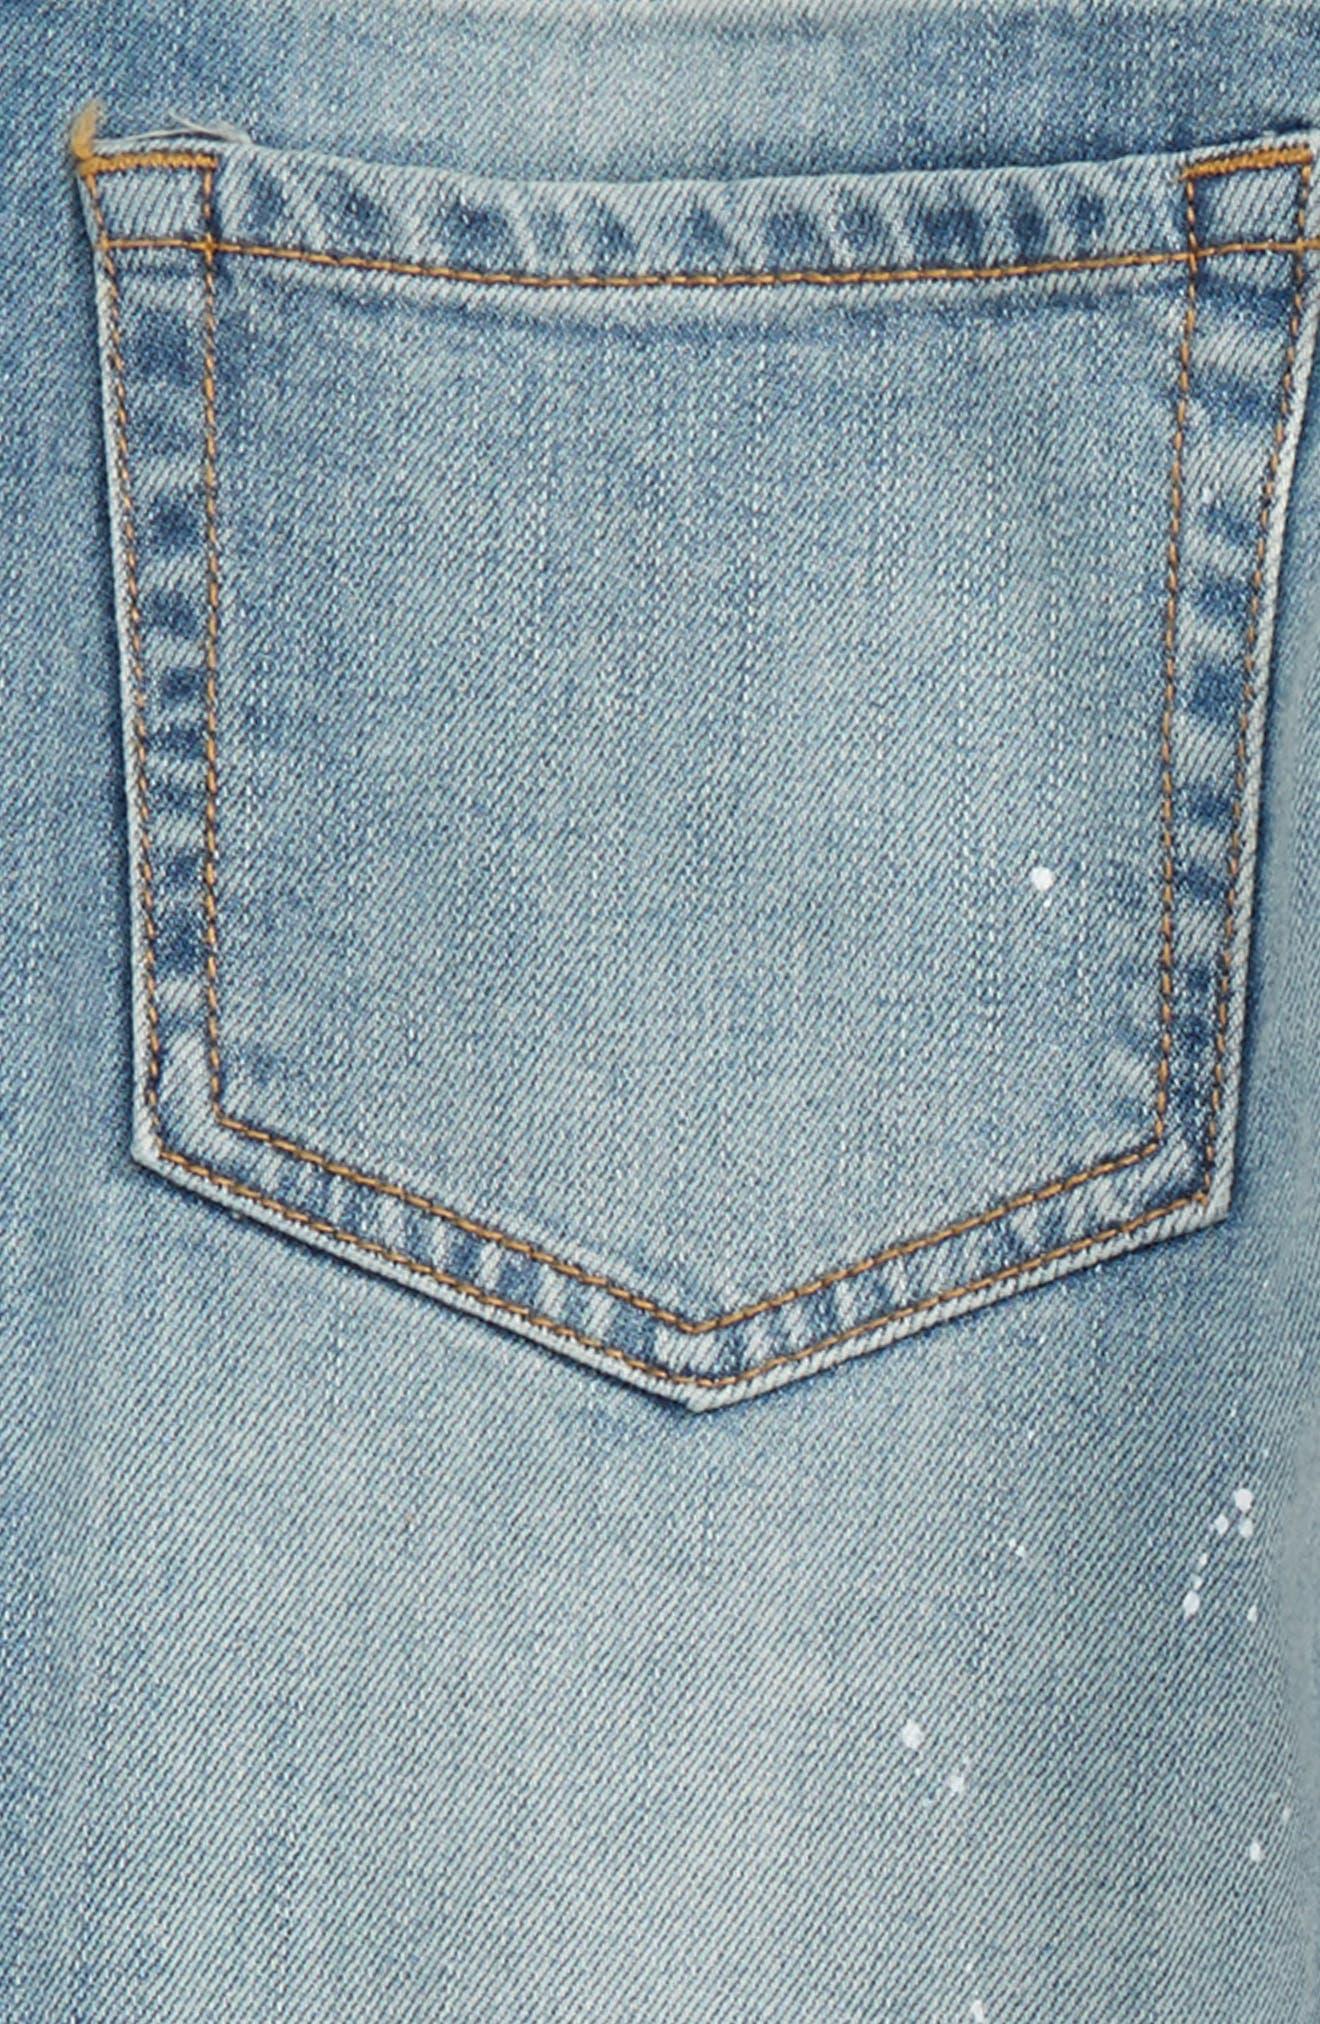 Crop Distressed Girlfriend Jeans,                             Alternate thumbnail 3, color,